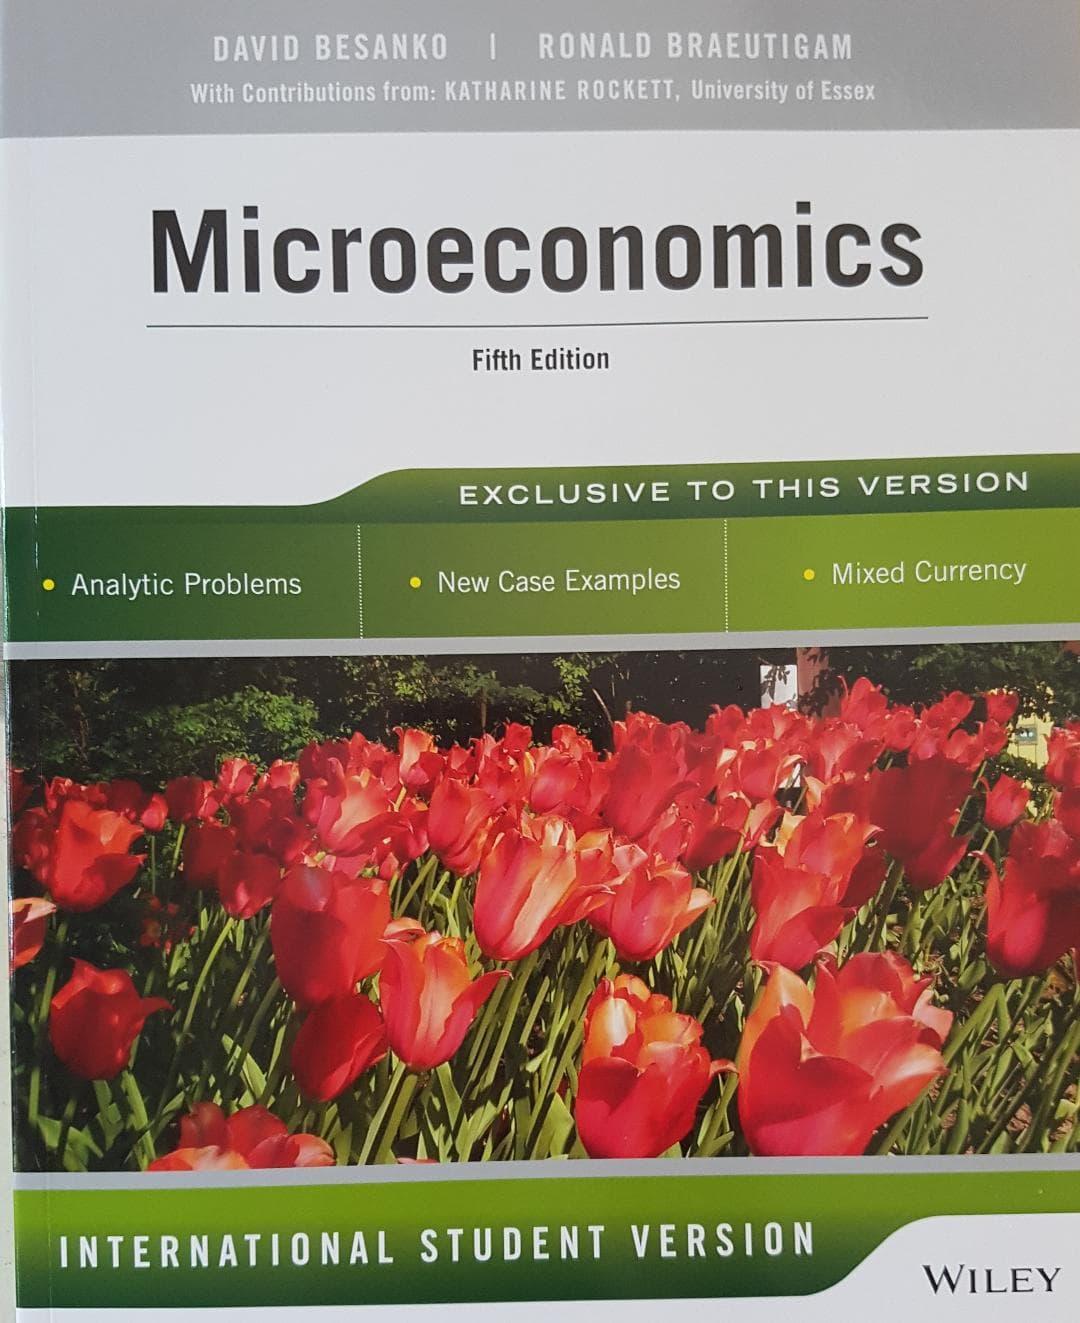 [ORIGINAL] Microeconomics 5e - David Besanko